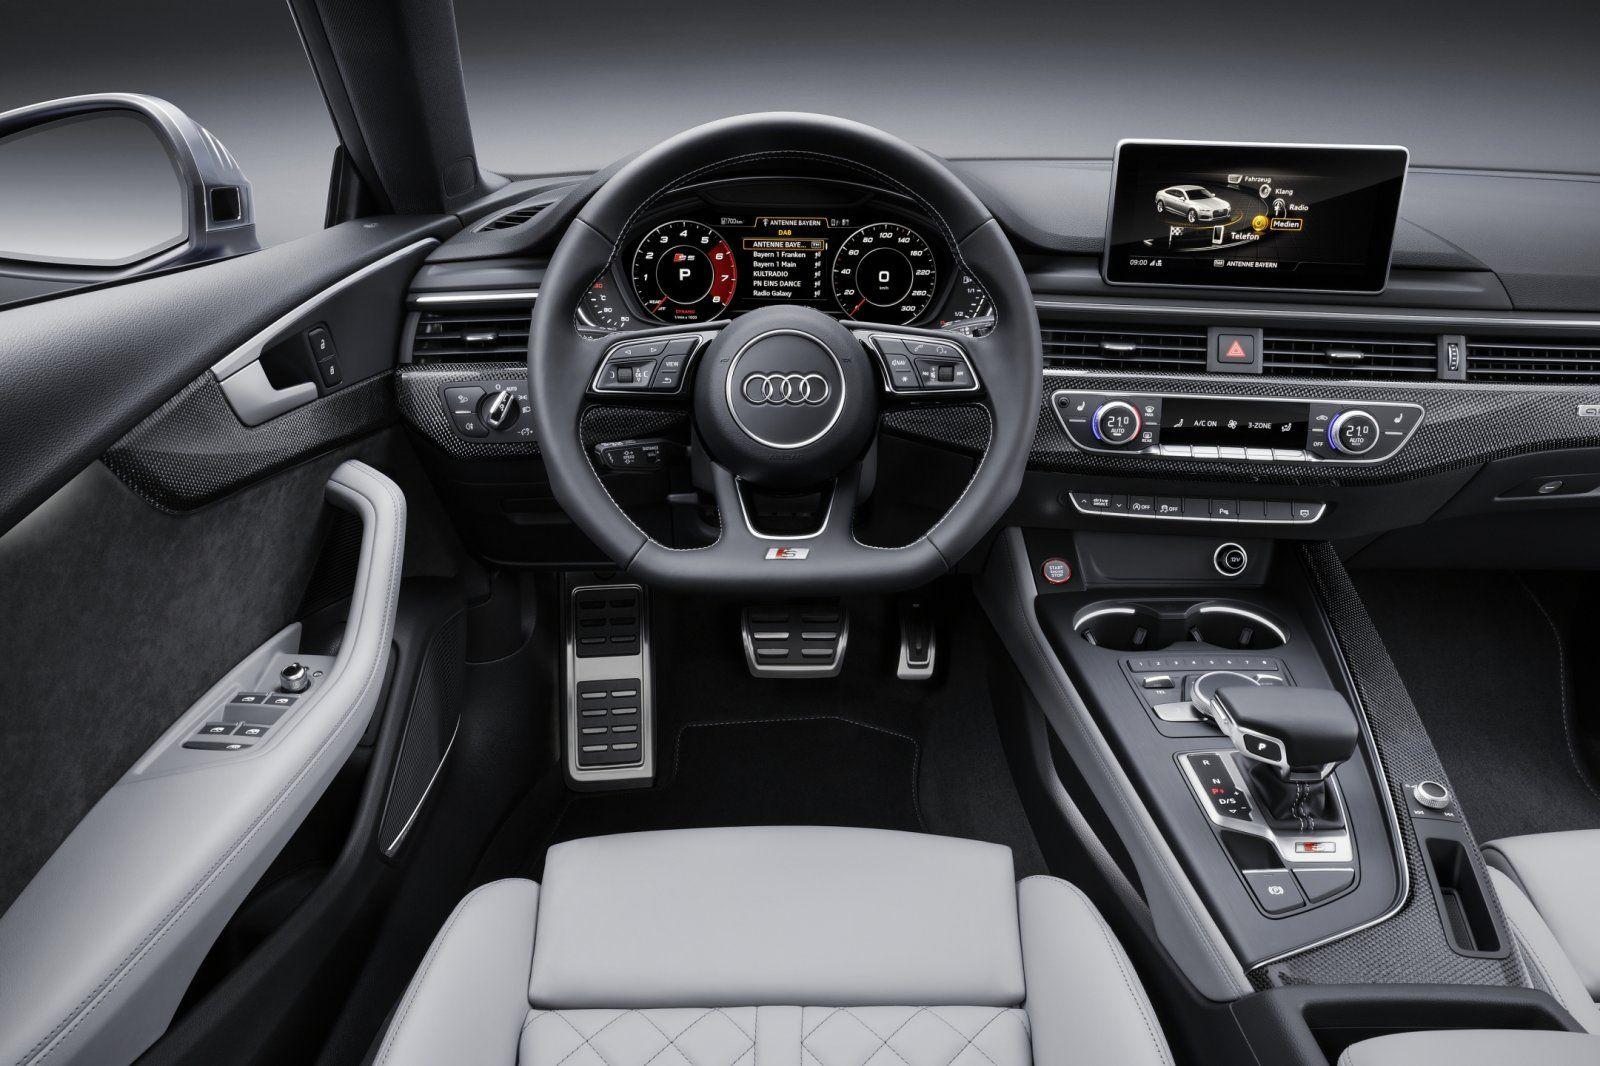 2017 New Audi A5 Sportback Audi S5 Audi Audi A5